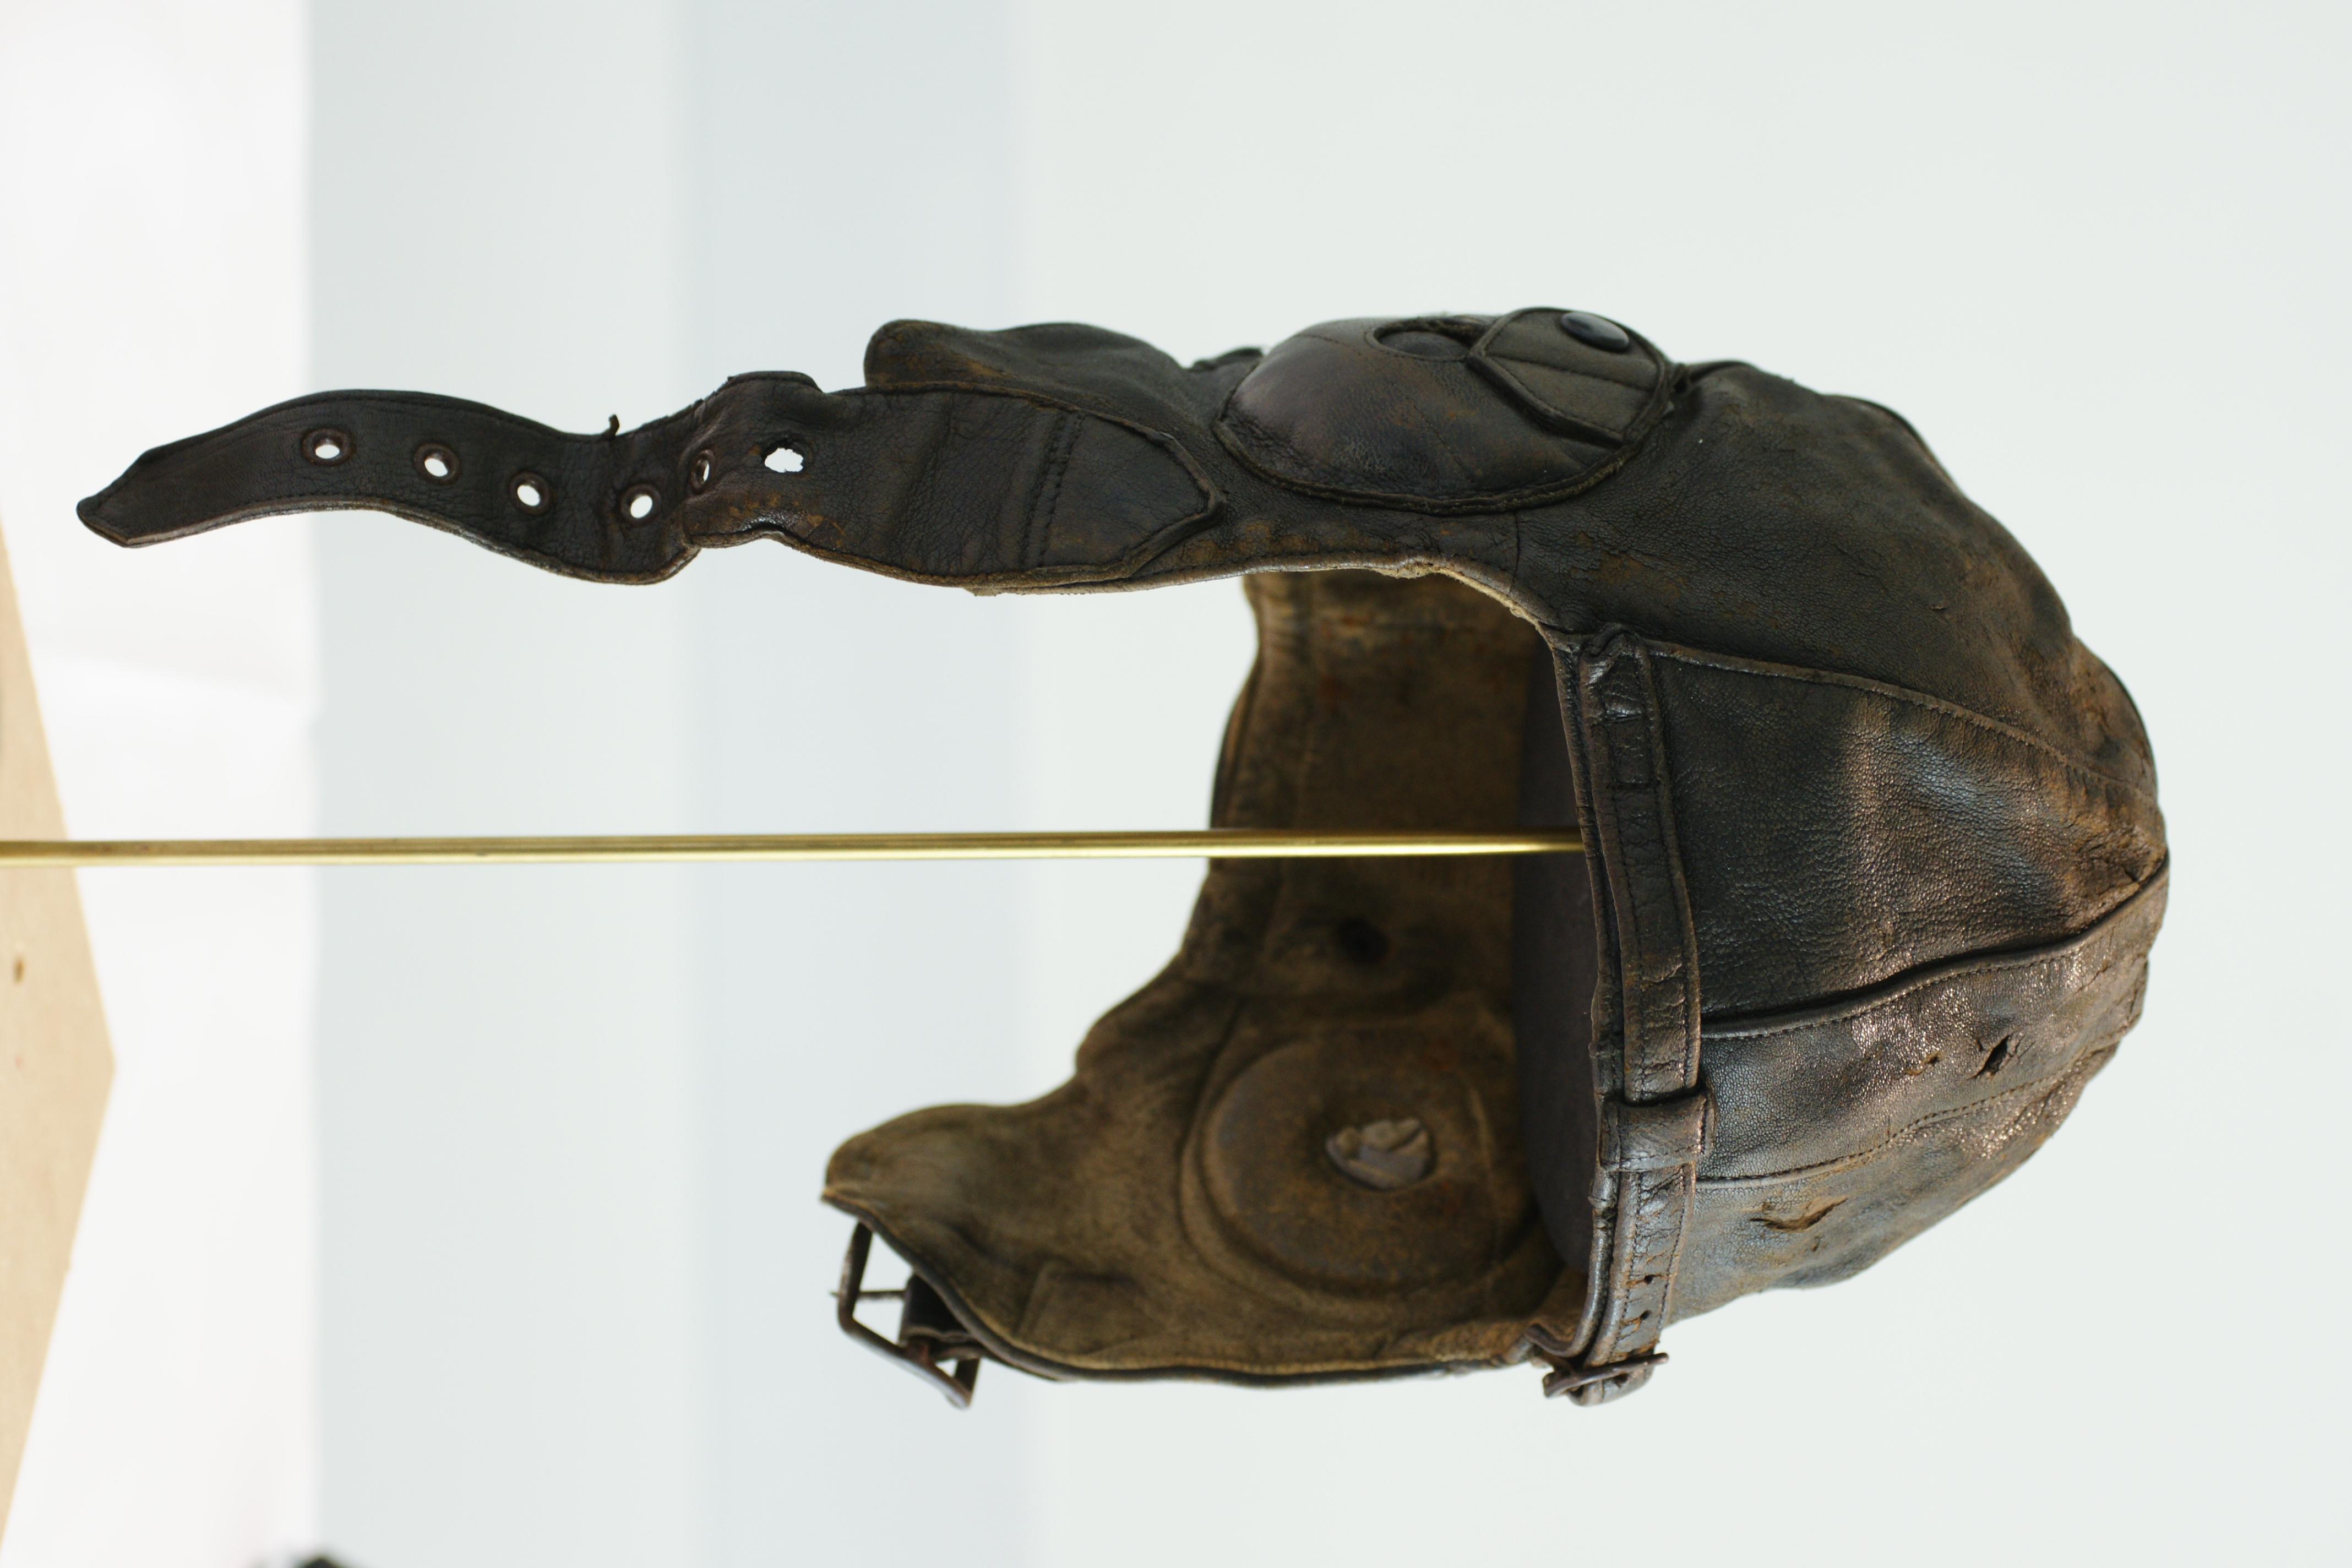 Leather flying helmet - Wikipedia